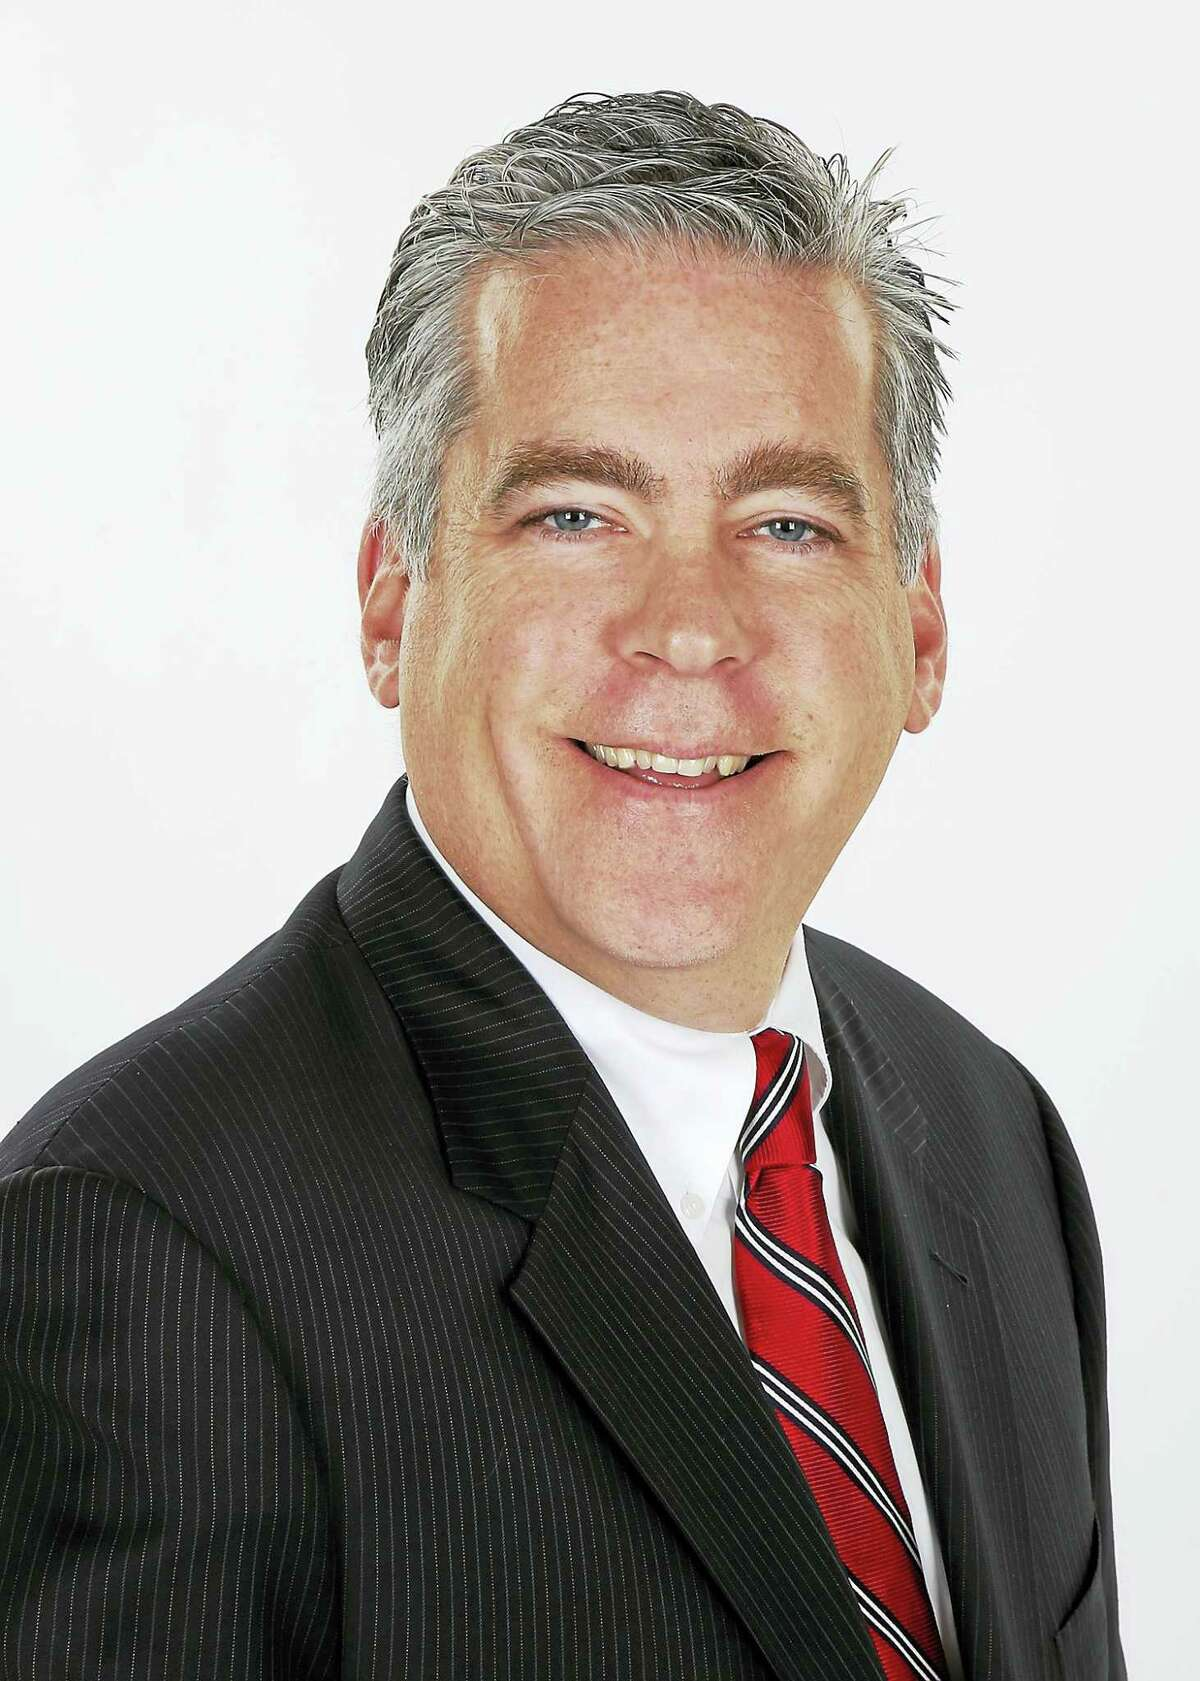 Joseph Matthews